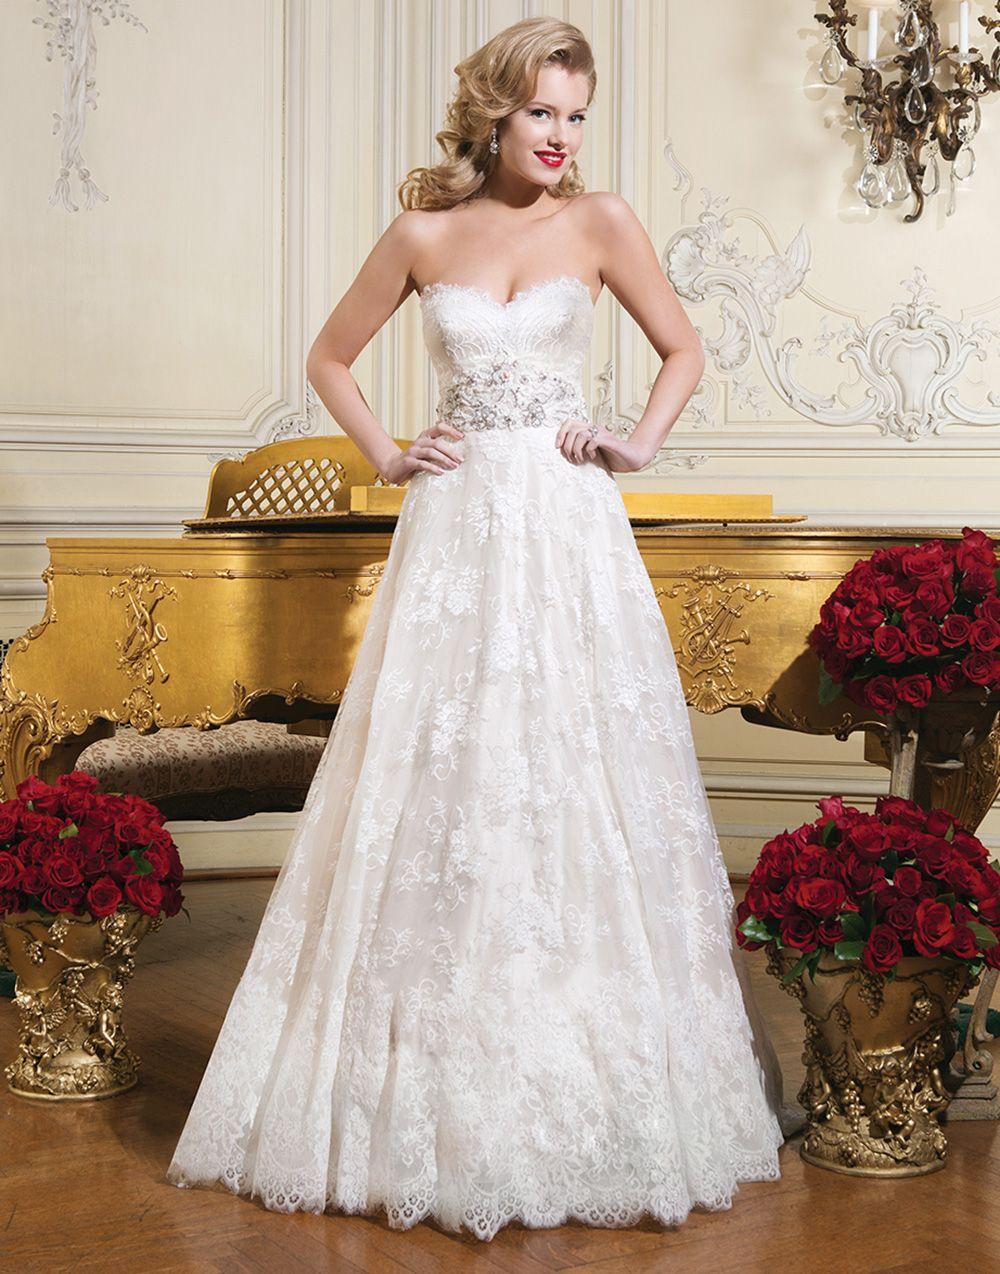 Gorgeous Justin Alexander wedding dress style 8766 - Chantilly lace ...